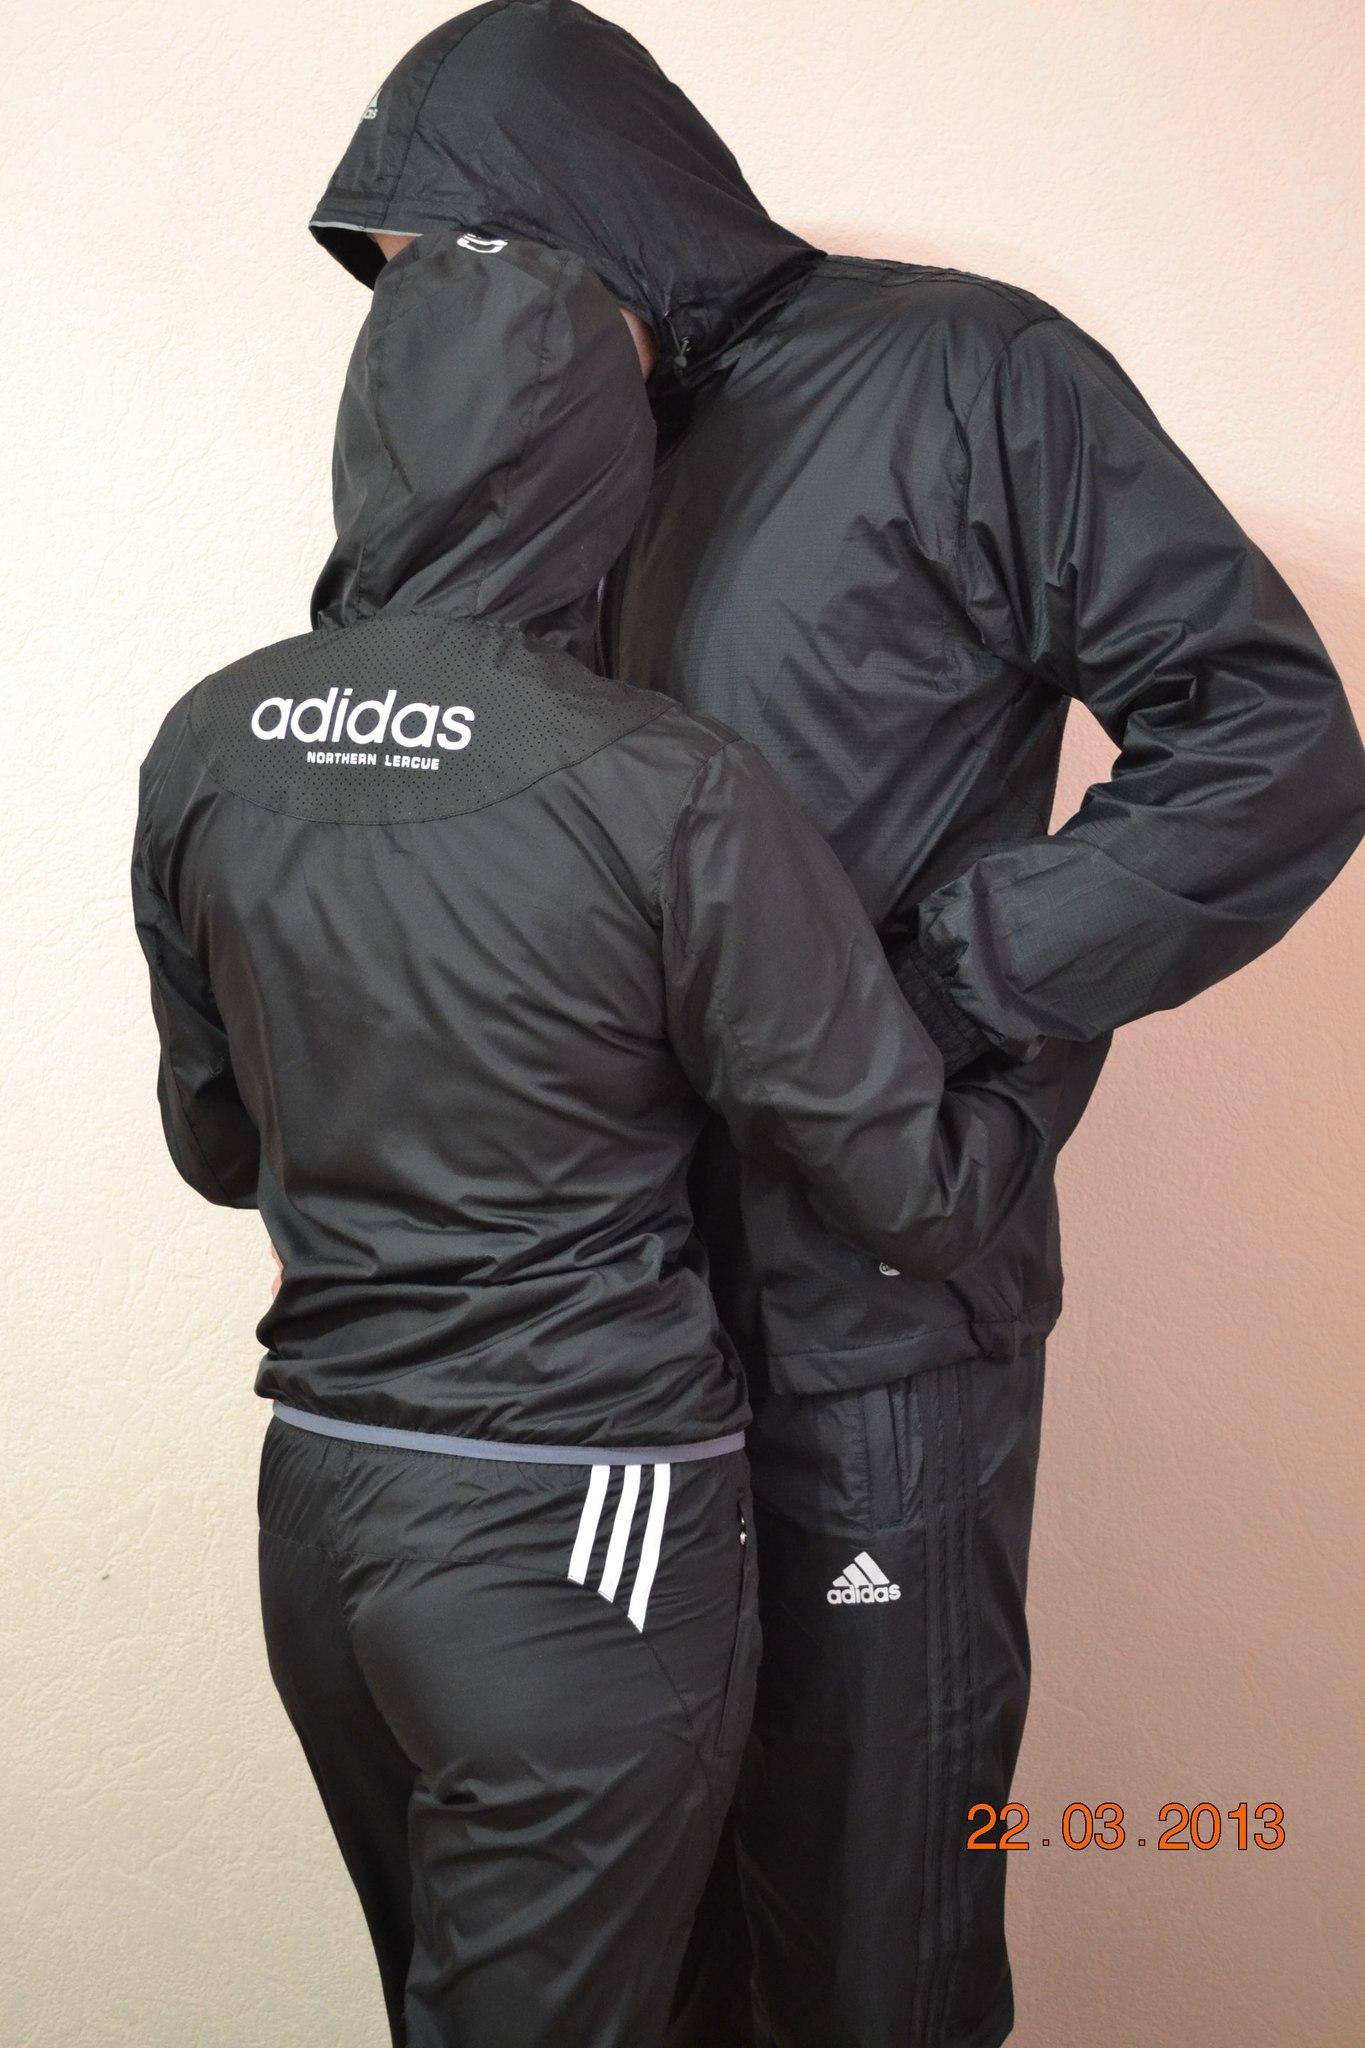 Cute Adidas Couple